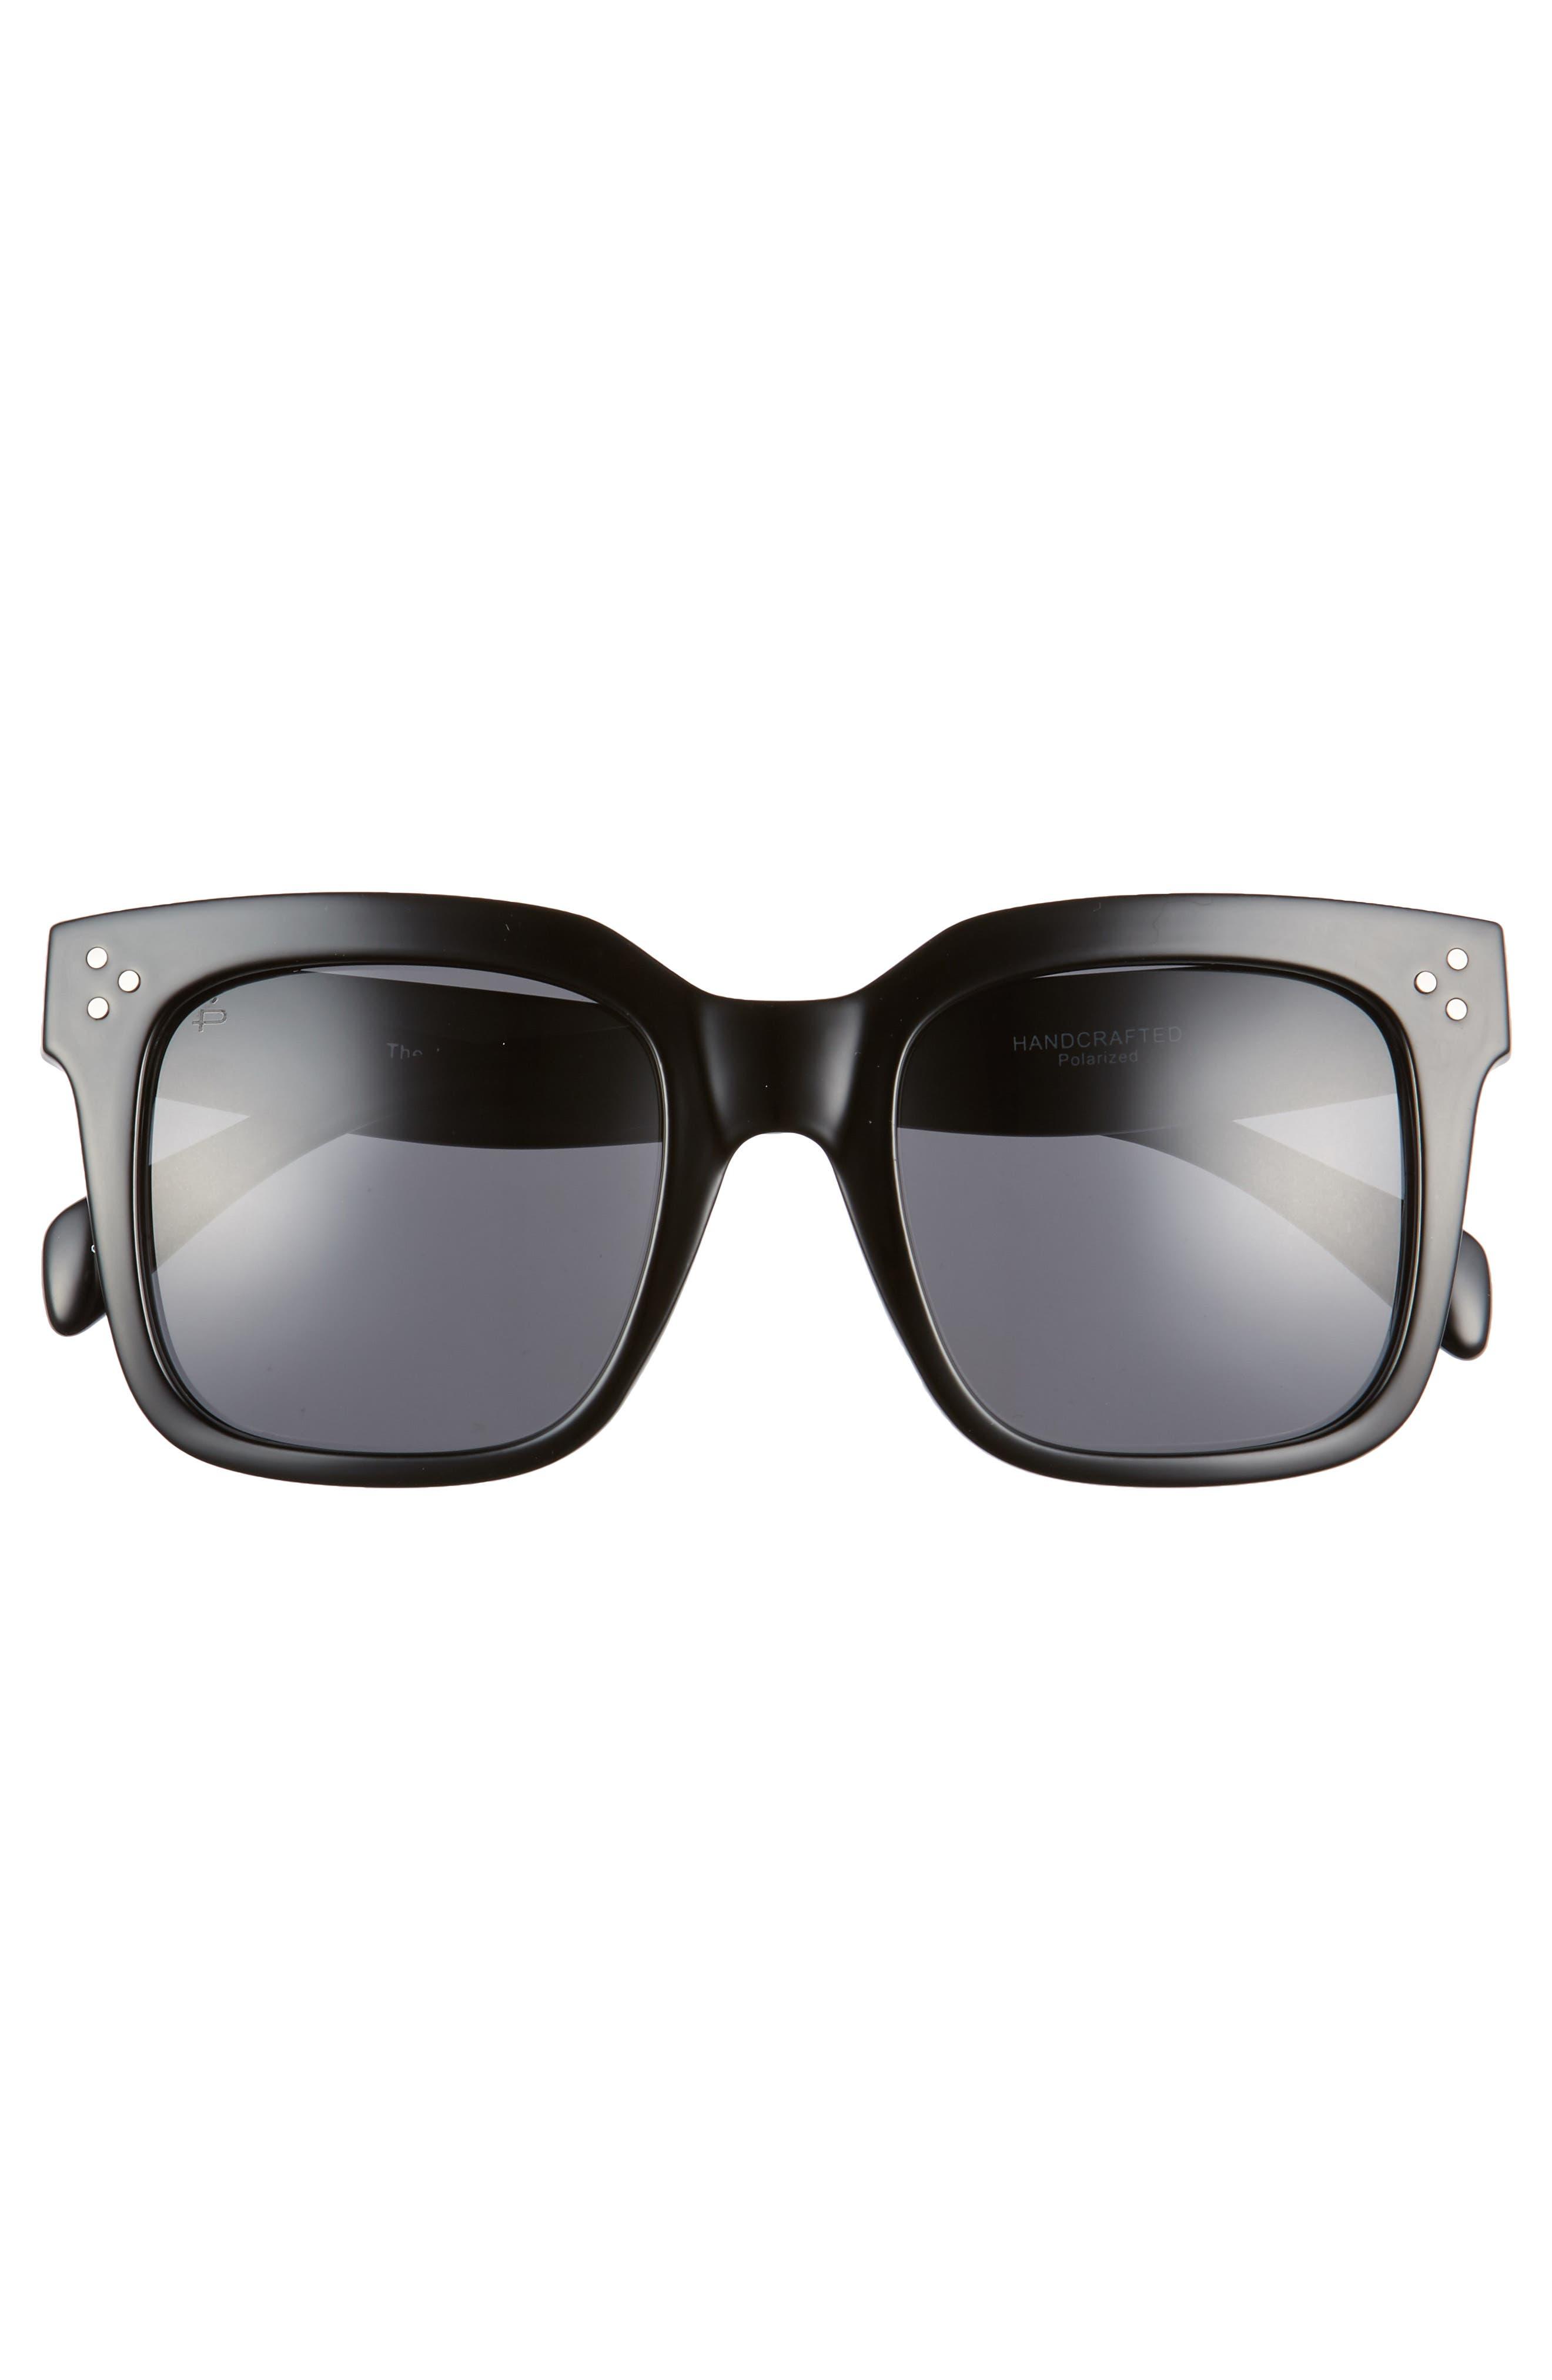 Privé Revaux The Heroine 53mm Sunglasses,                             Alternate thumbnail 3, color,                             Black